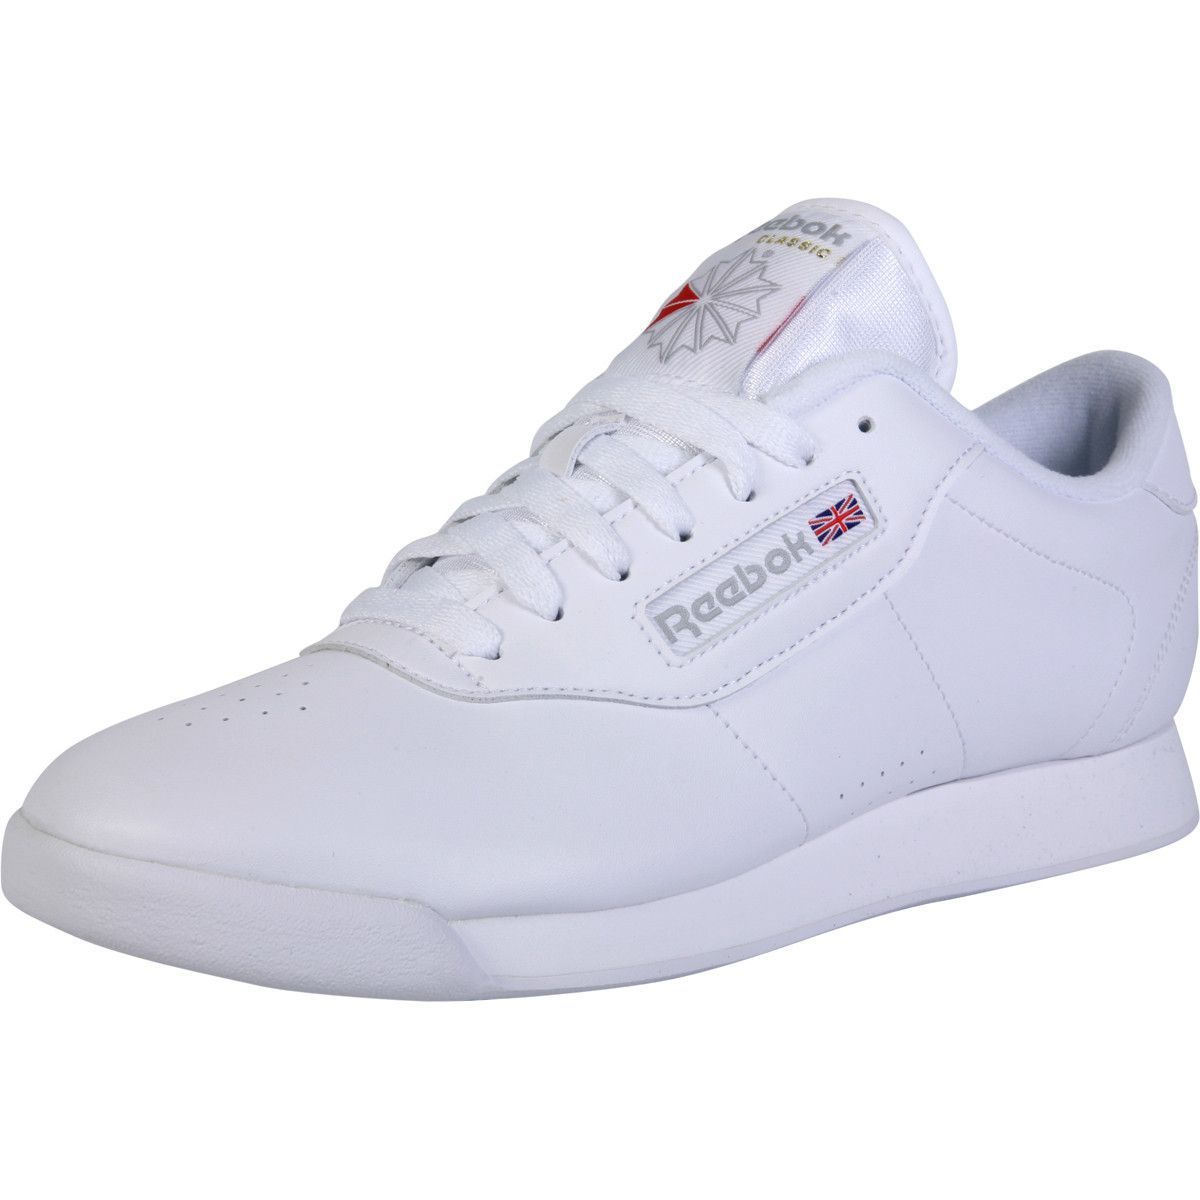 Sneaker Princess Low in Classic 2019ReebokSneakers90s kZiXuP